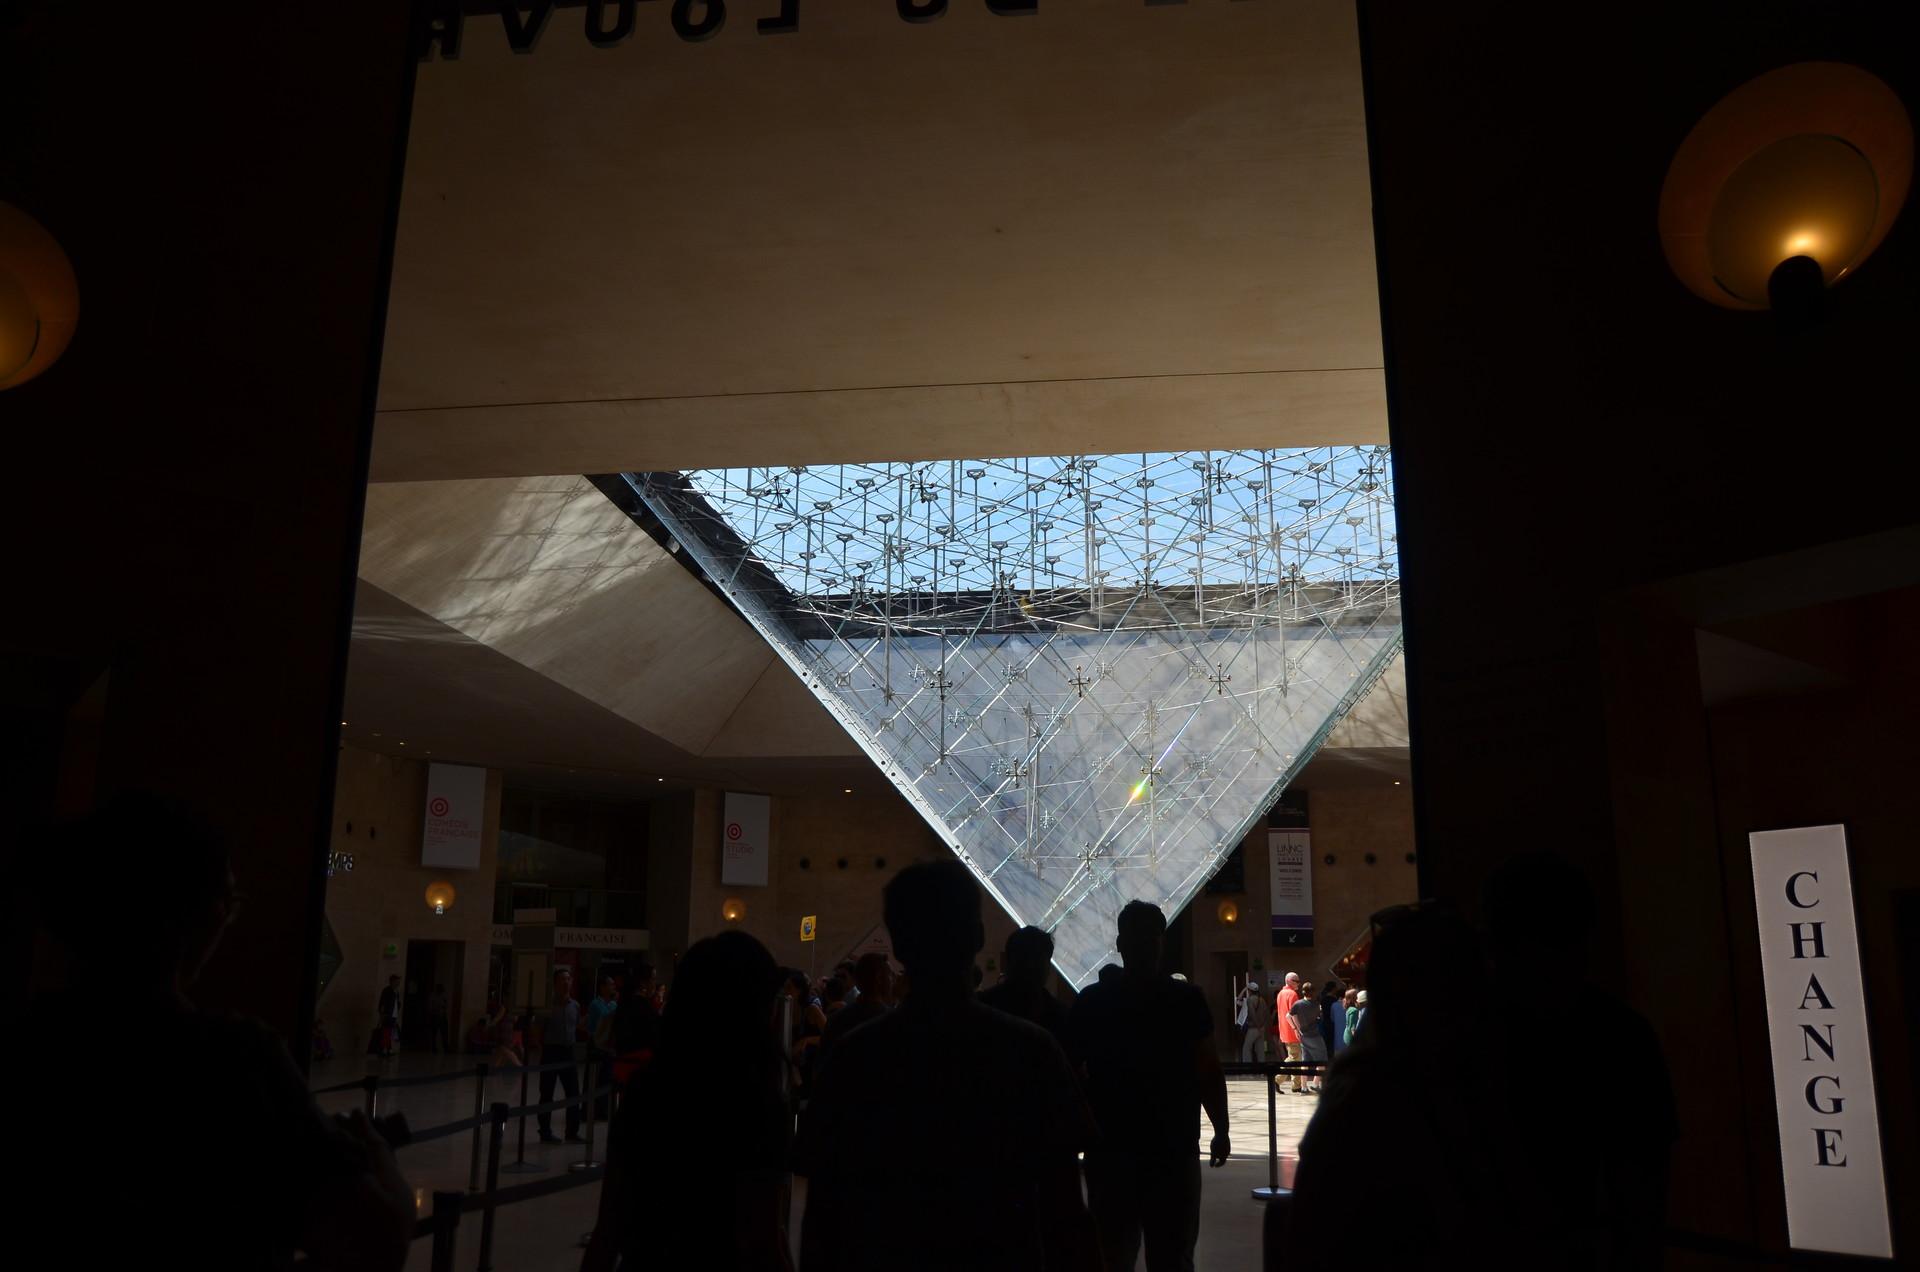 big-museum-lot-91555299c2ebd58c450dfa6fb